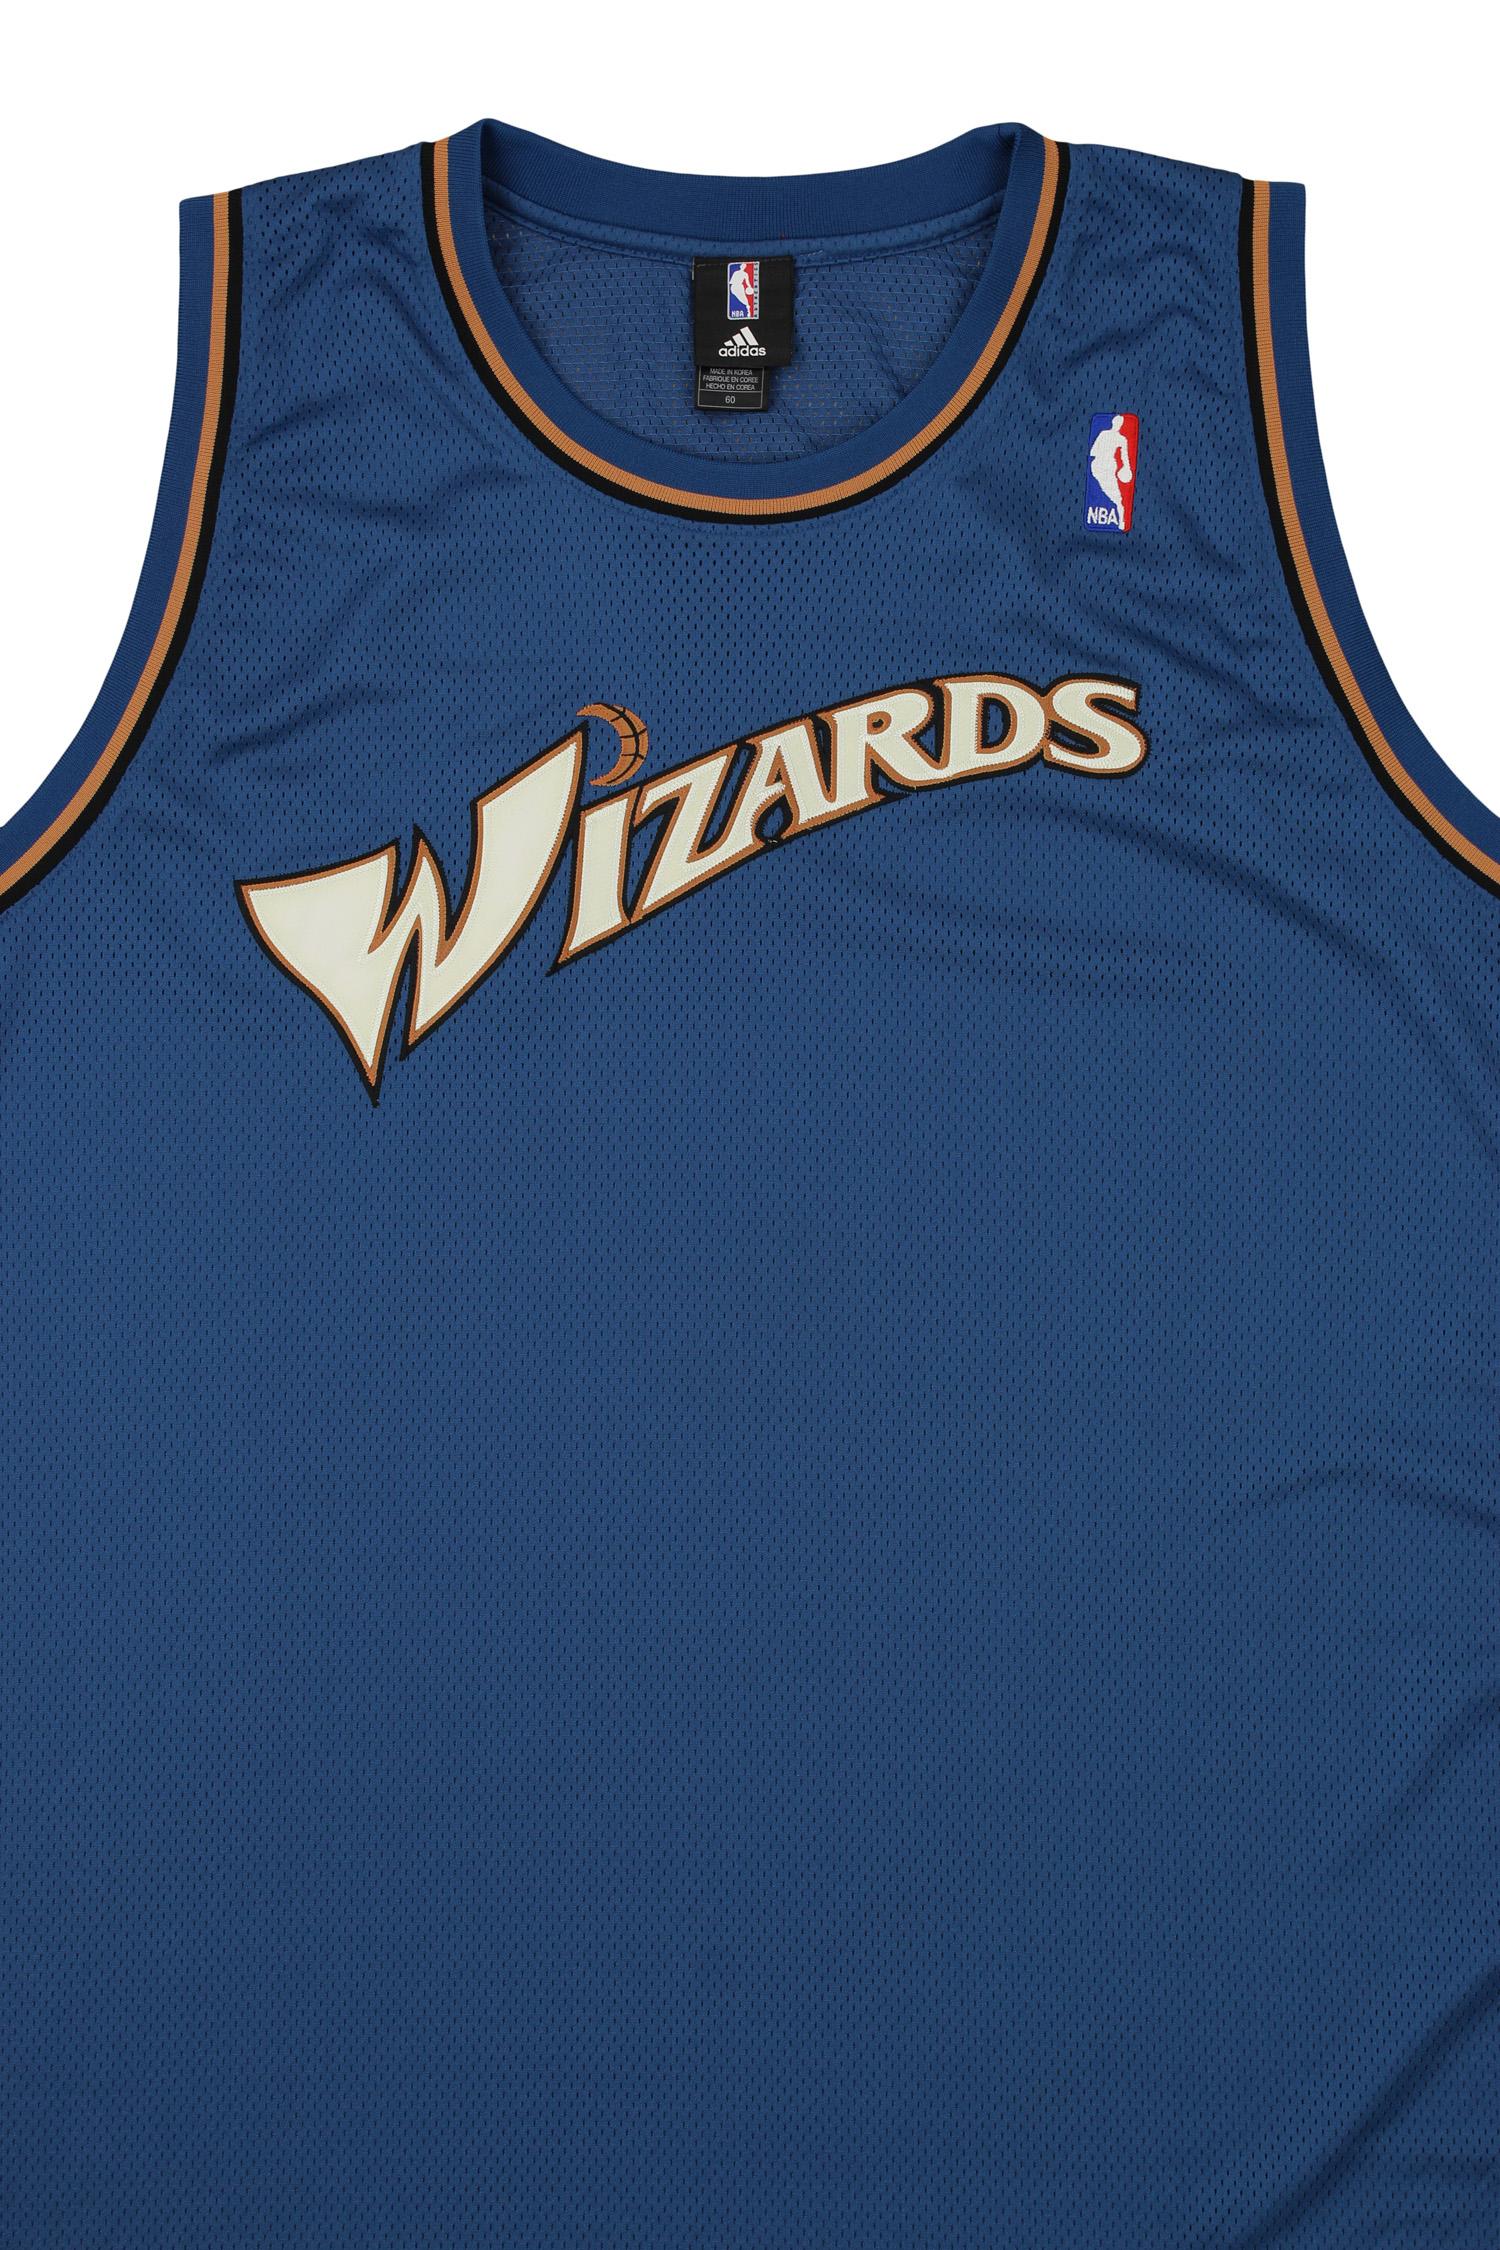 Adidas NBA Men/'s Minnesota Timberwolves Blank Basketball Jersey Blue